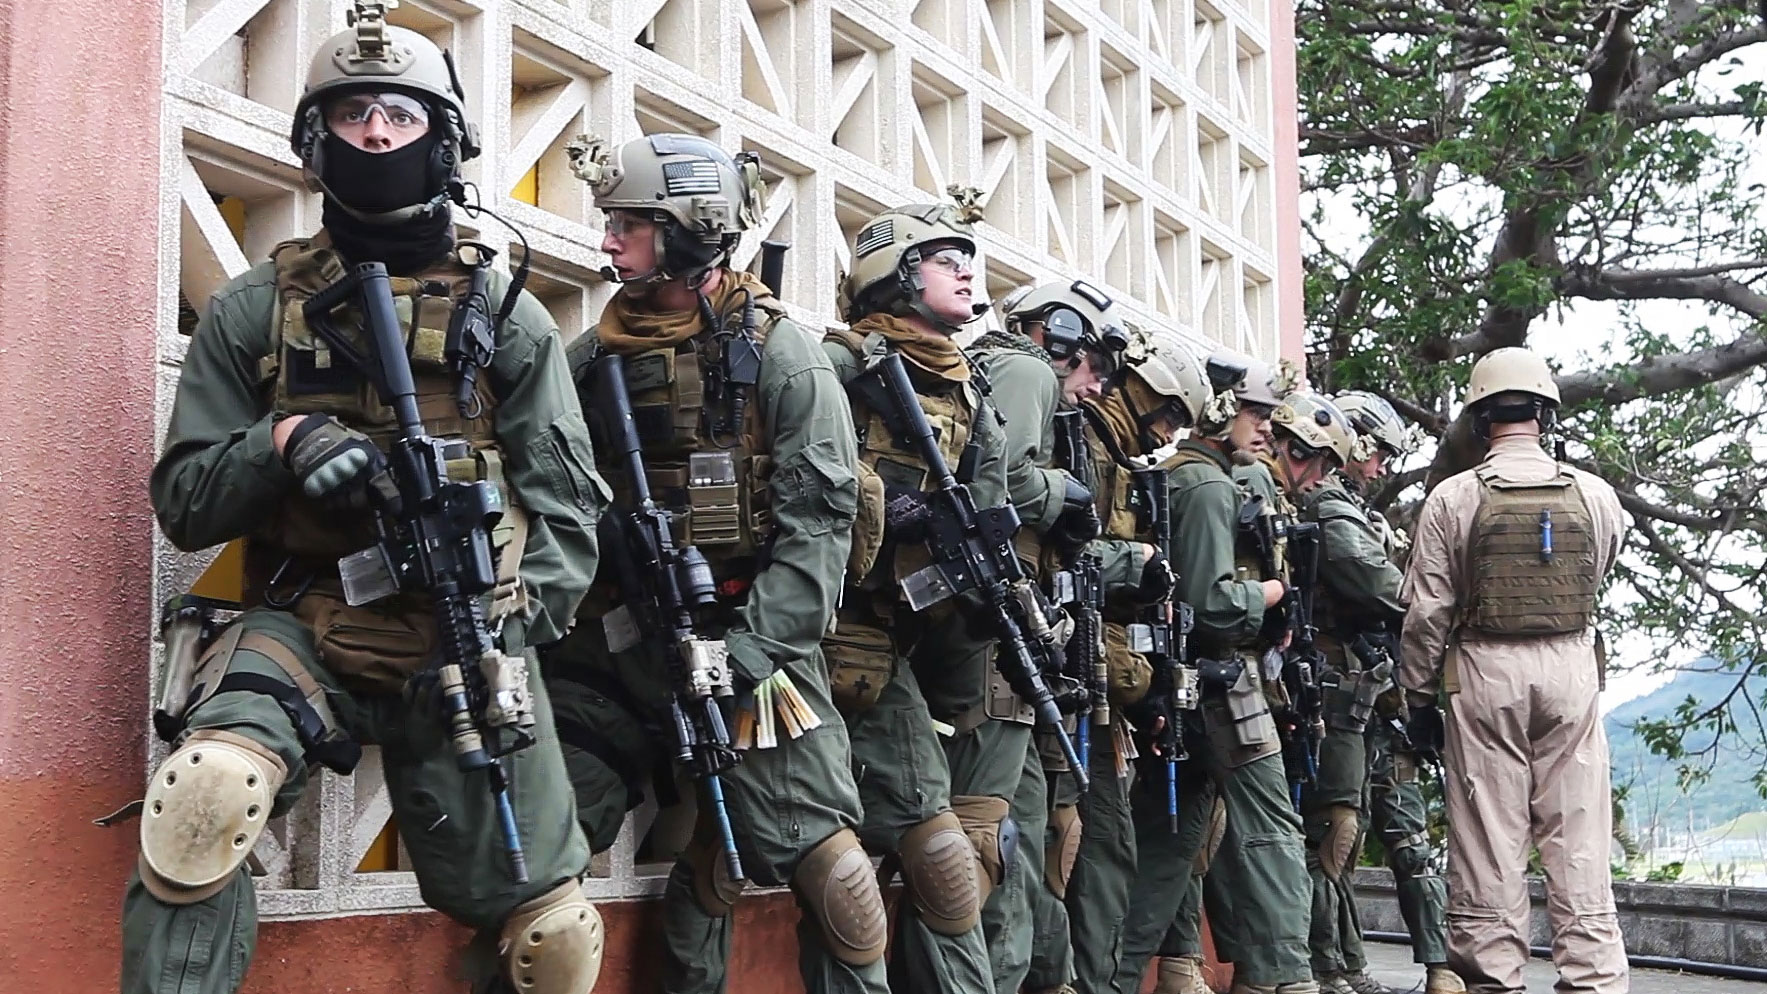 Photo : Force Recon Platoon 31st MEU Marines